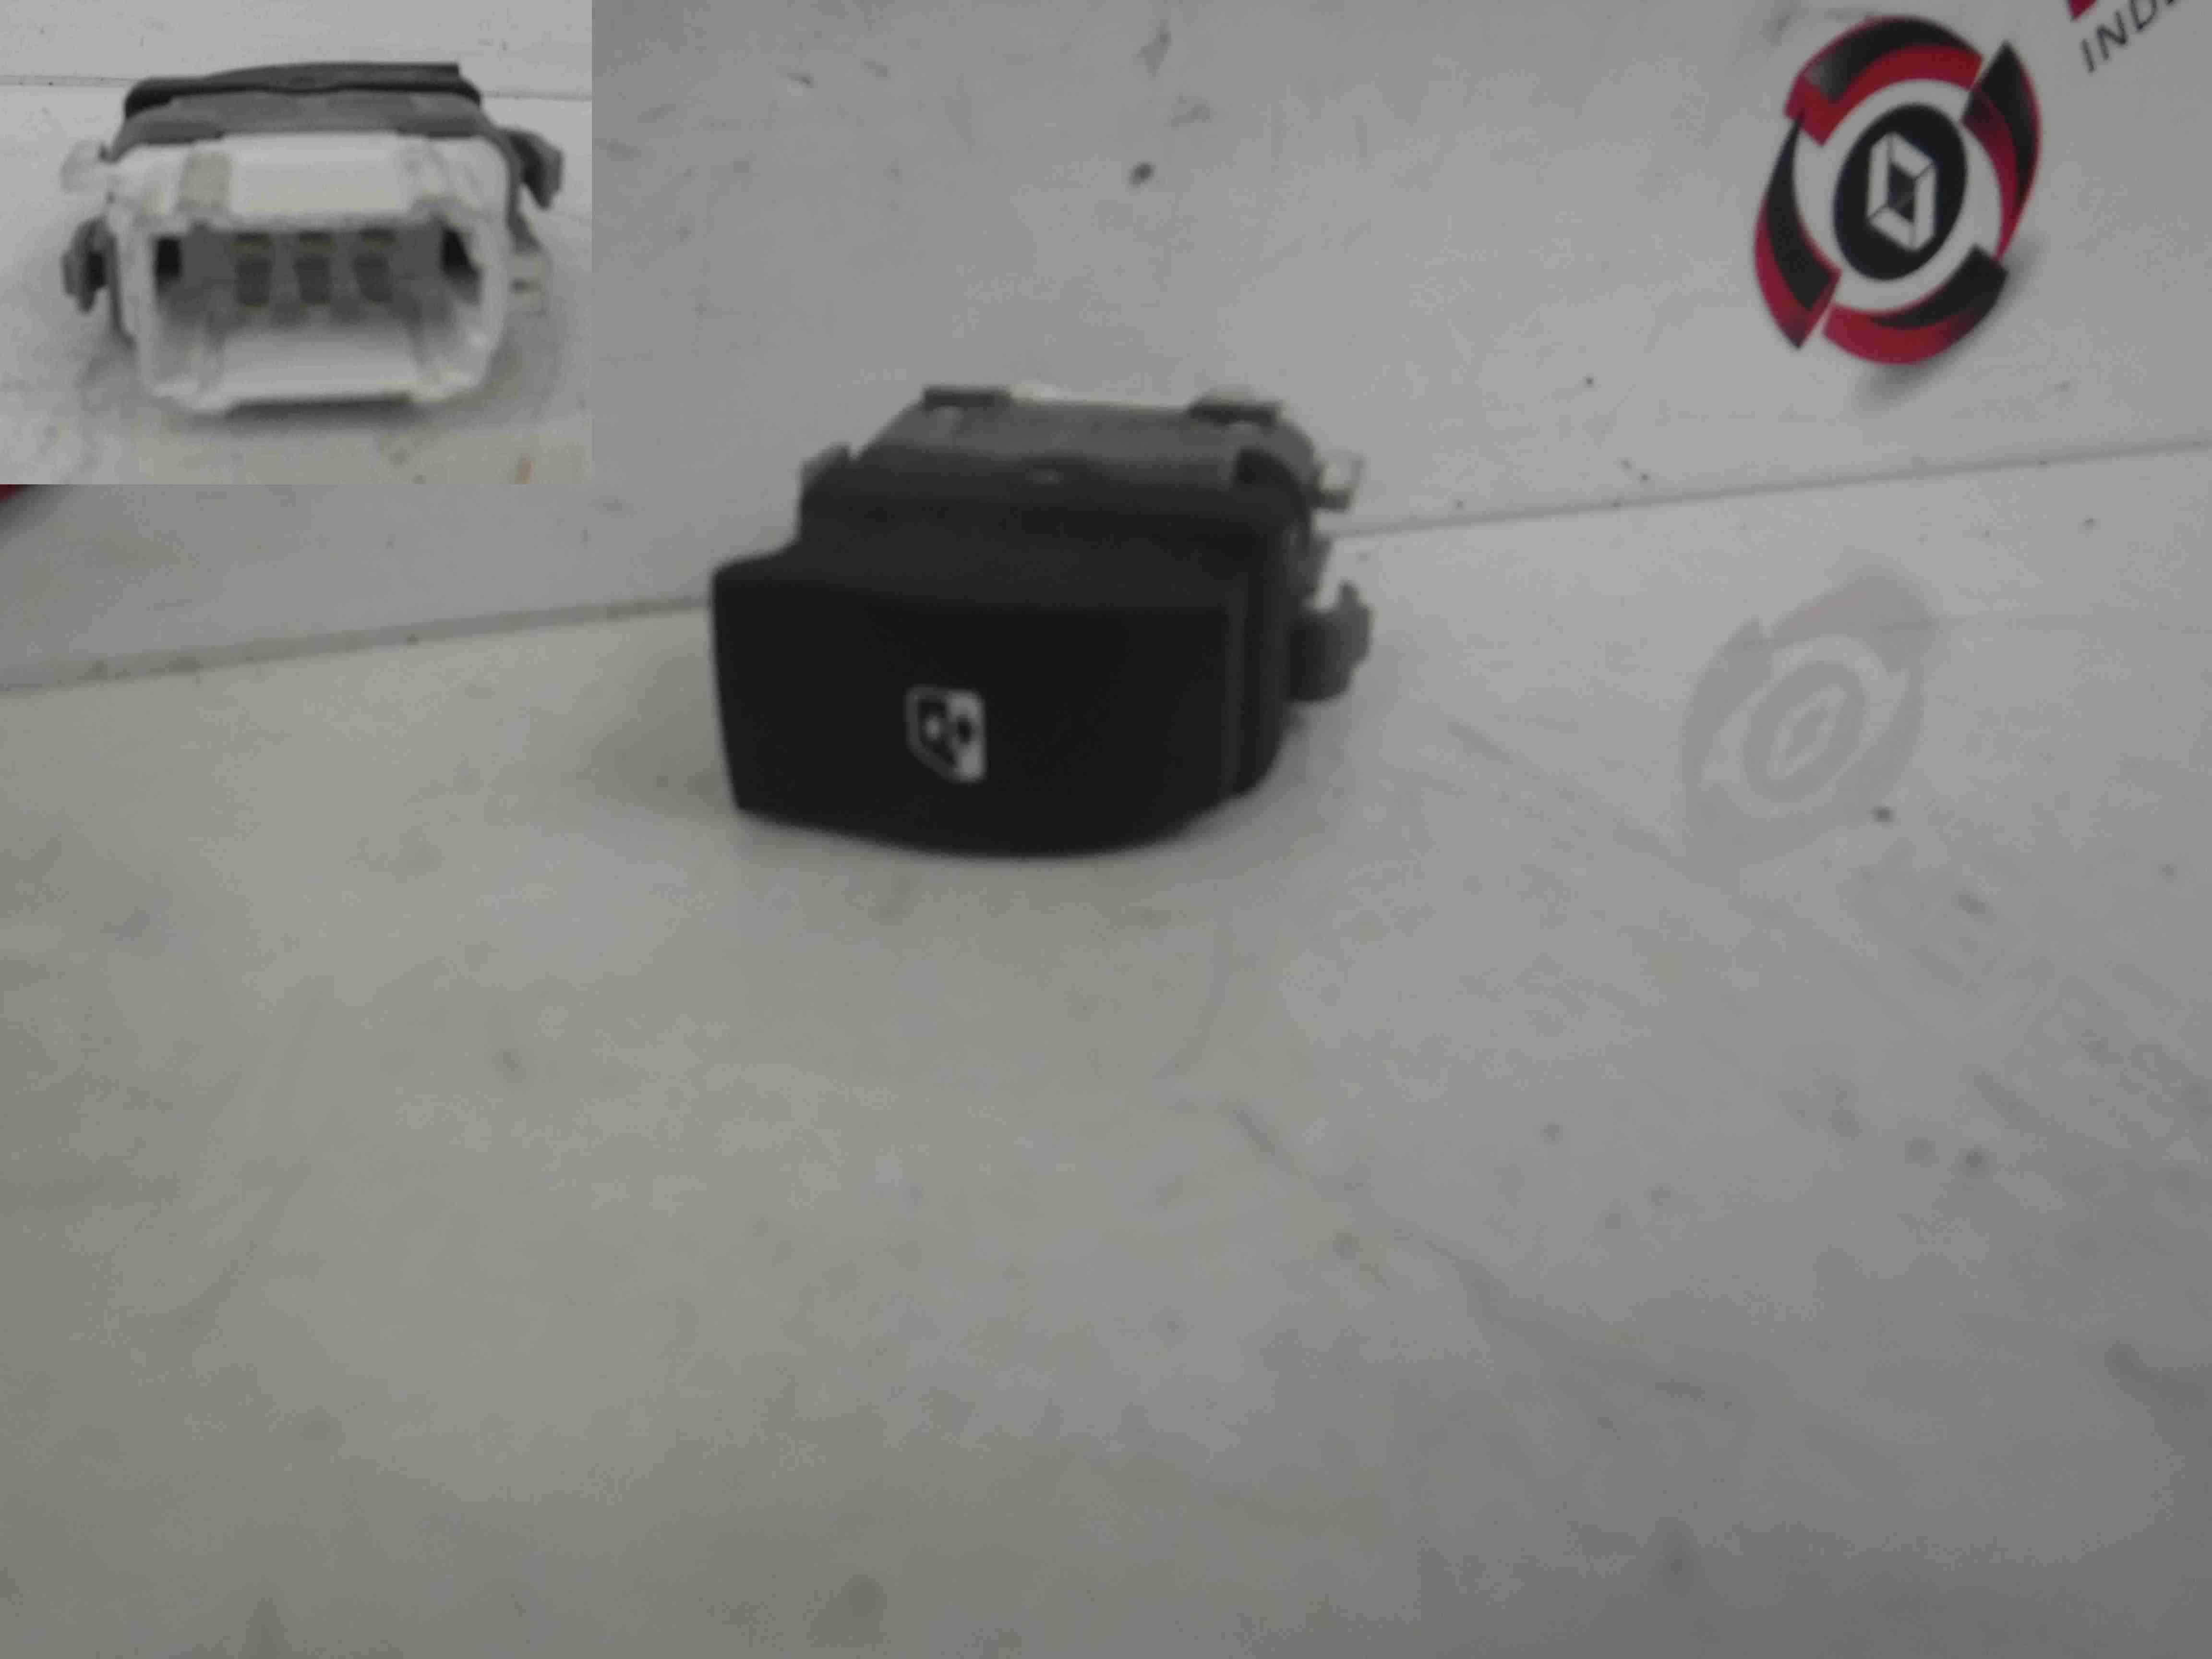 Renault Espace 2003-2013 Passenger Drivers Rear Window Switch White Plug